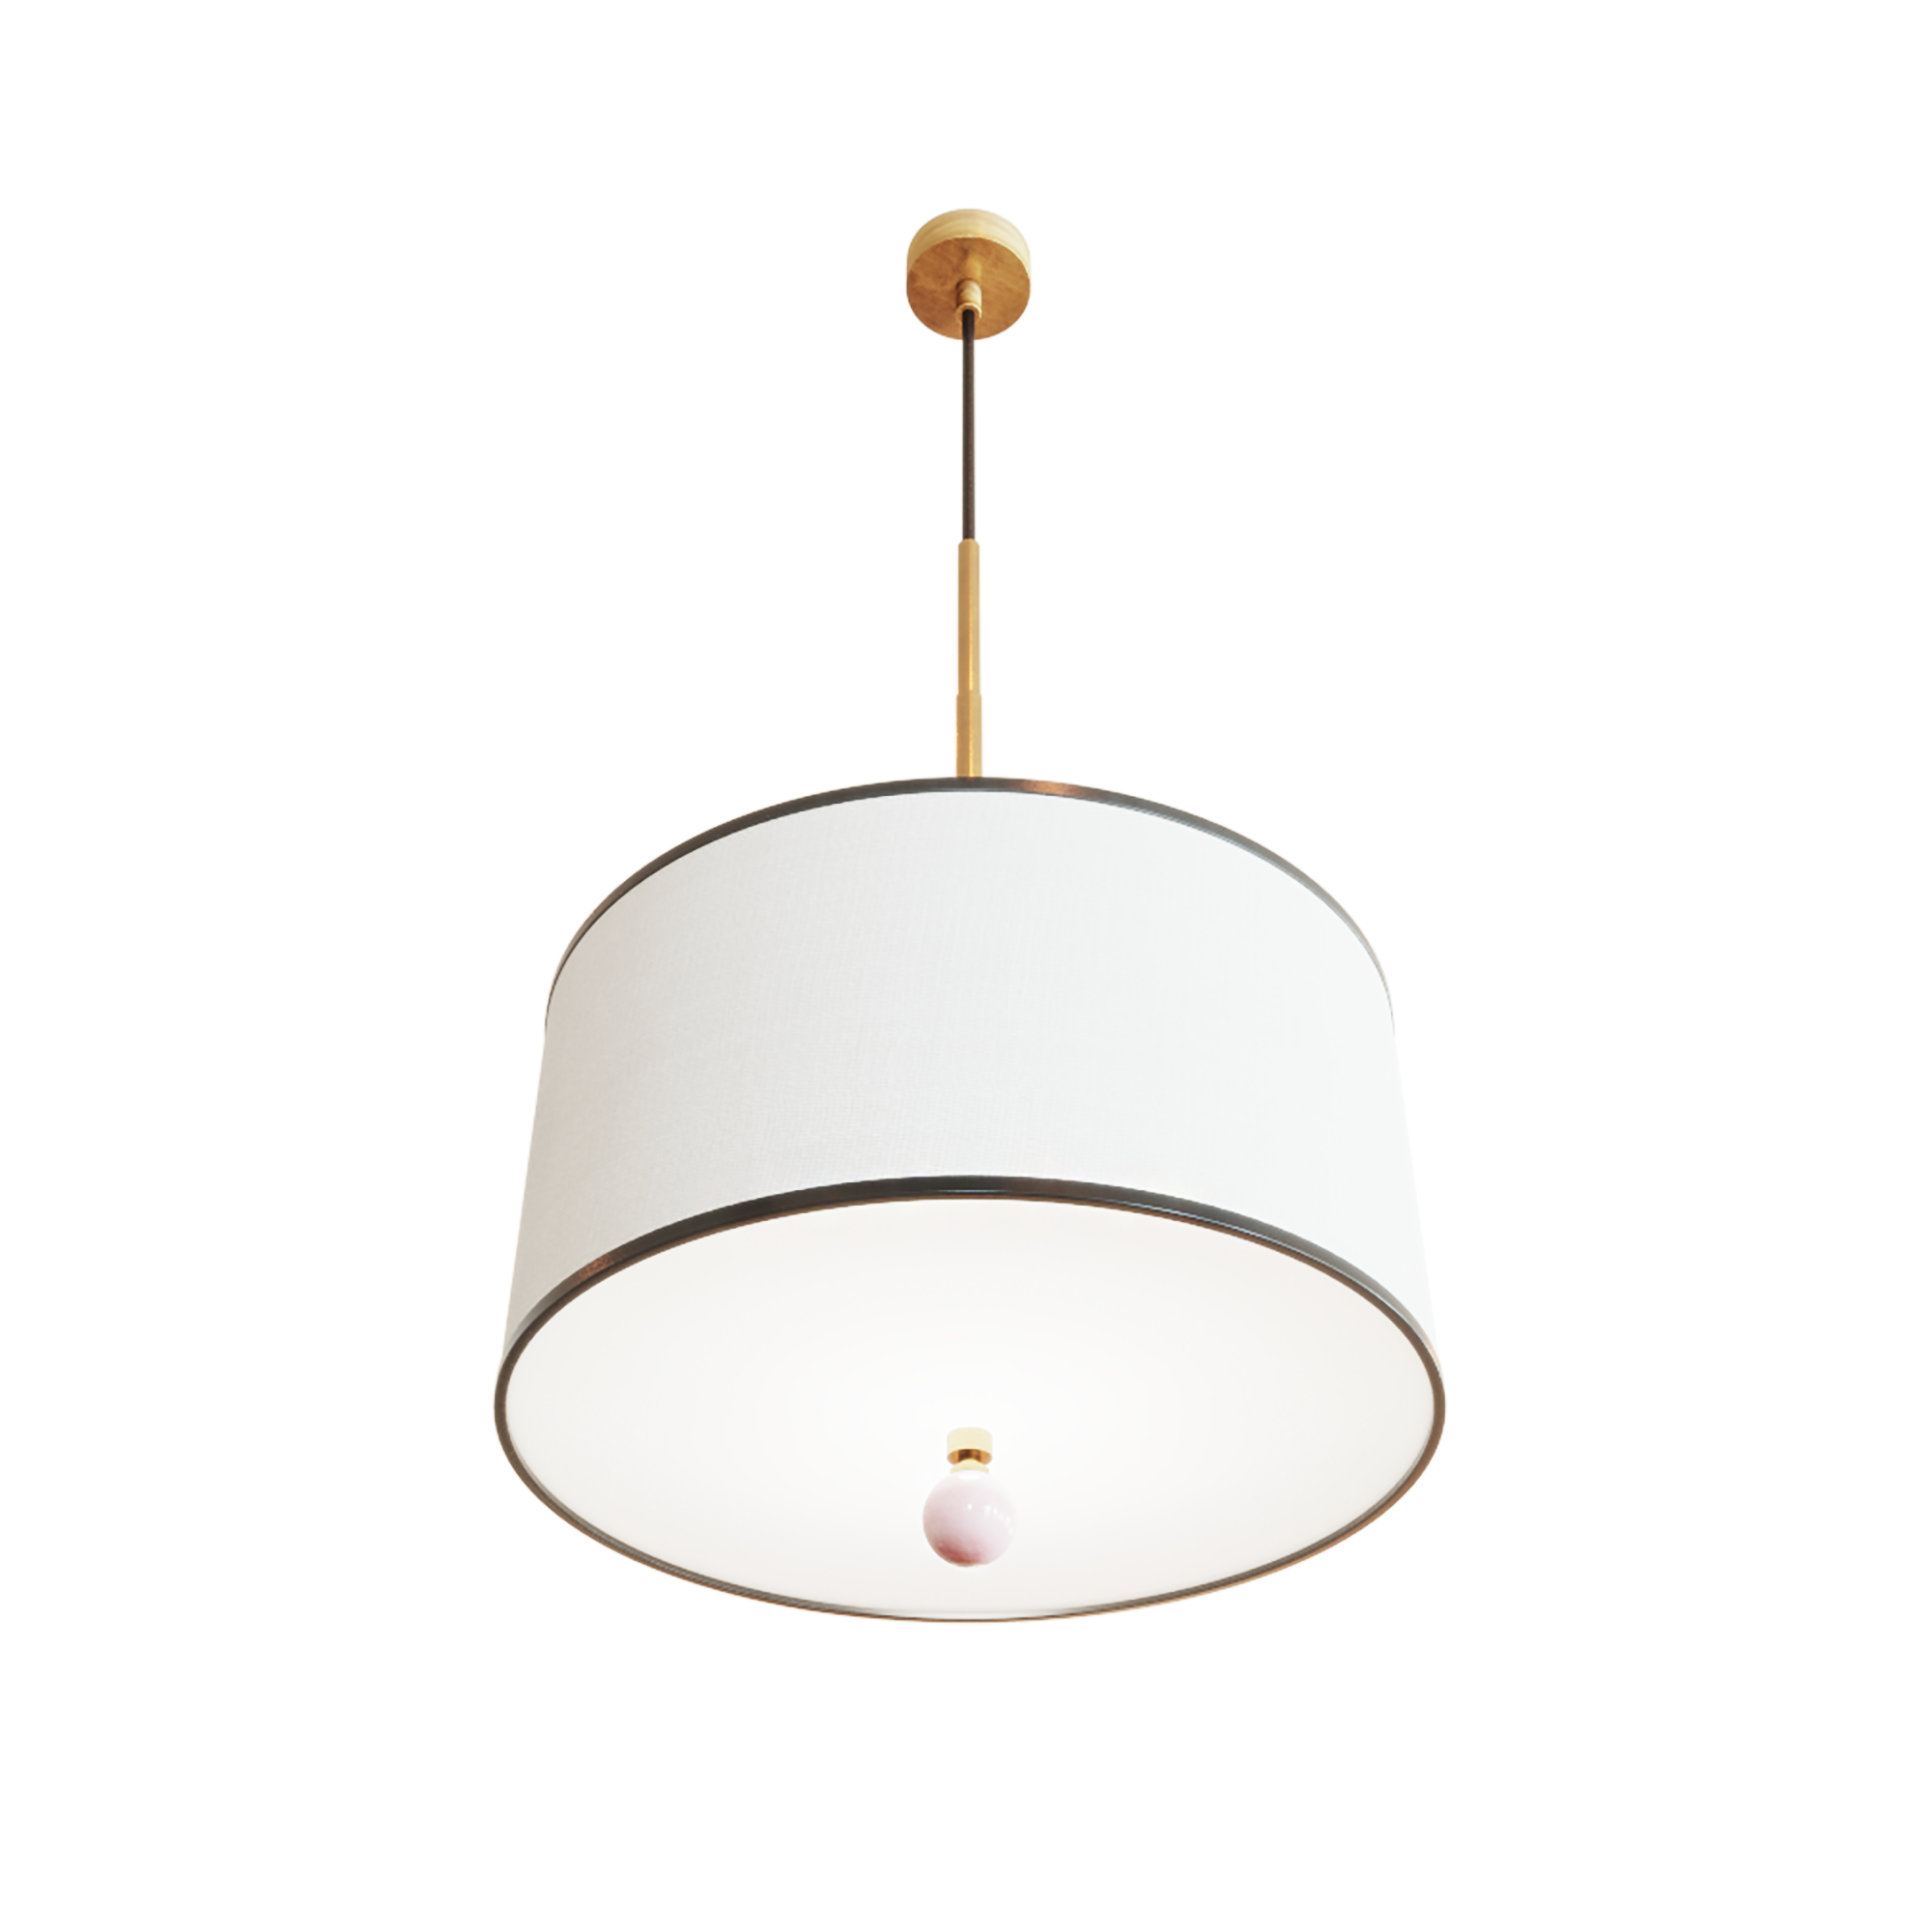 Подвесной светильник SP004 Any-Home - SP004 | AnyHome.ru